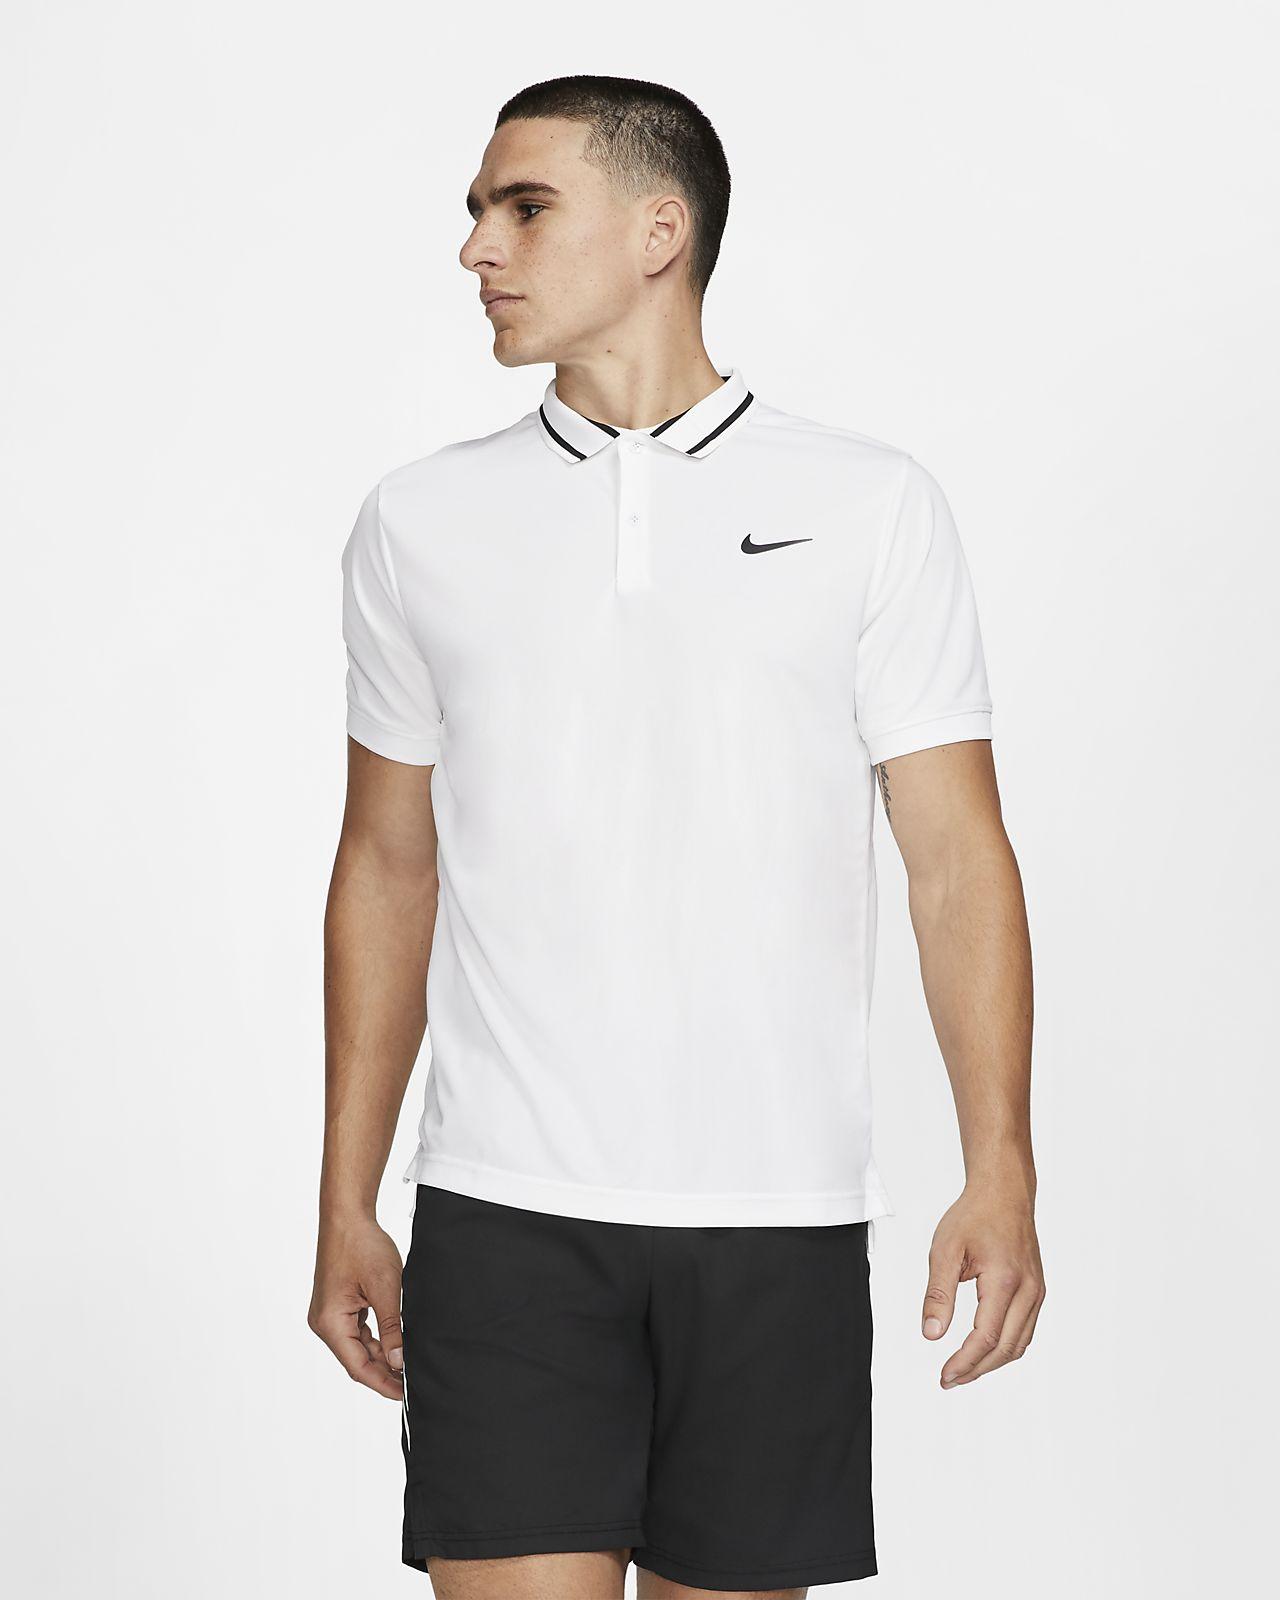 Tennispikétröja NikeCourt Dri-FIT för män